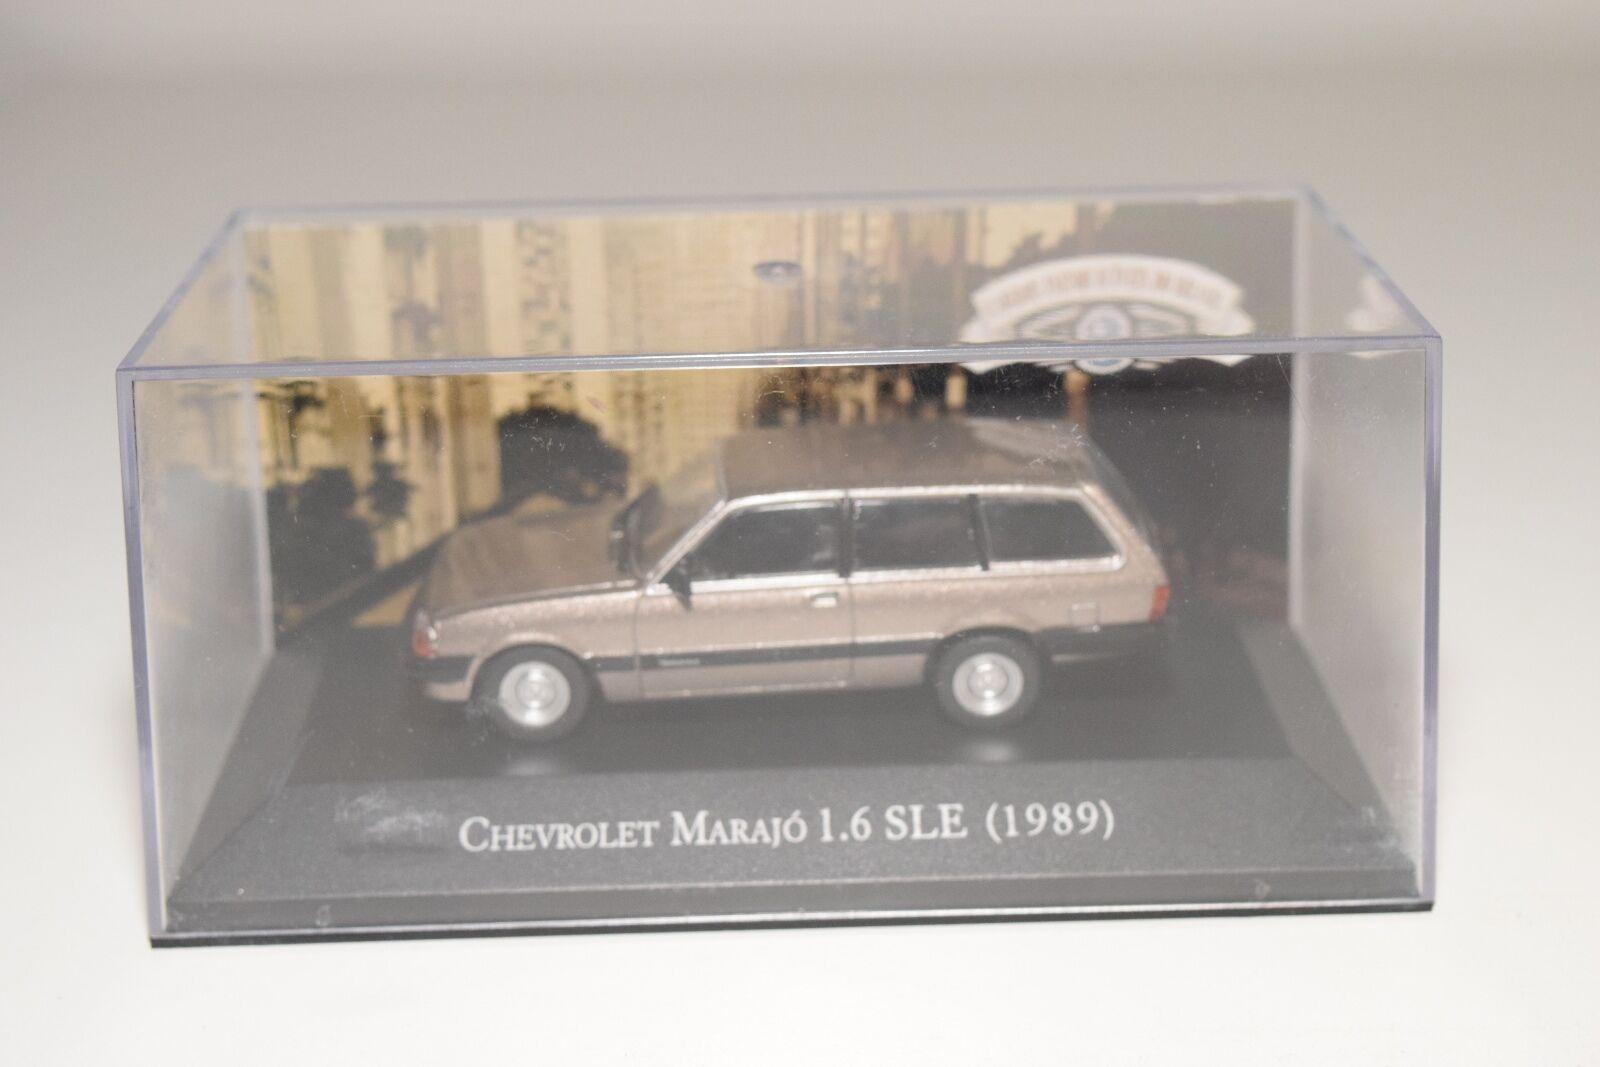 . ALTAYA IXO CHEVROLET CHEVROLET CHEVROLET MARAJO 1.6 SLE 1989 METALLIC CHAMPAGNE MINT BOXED 2b6df7